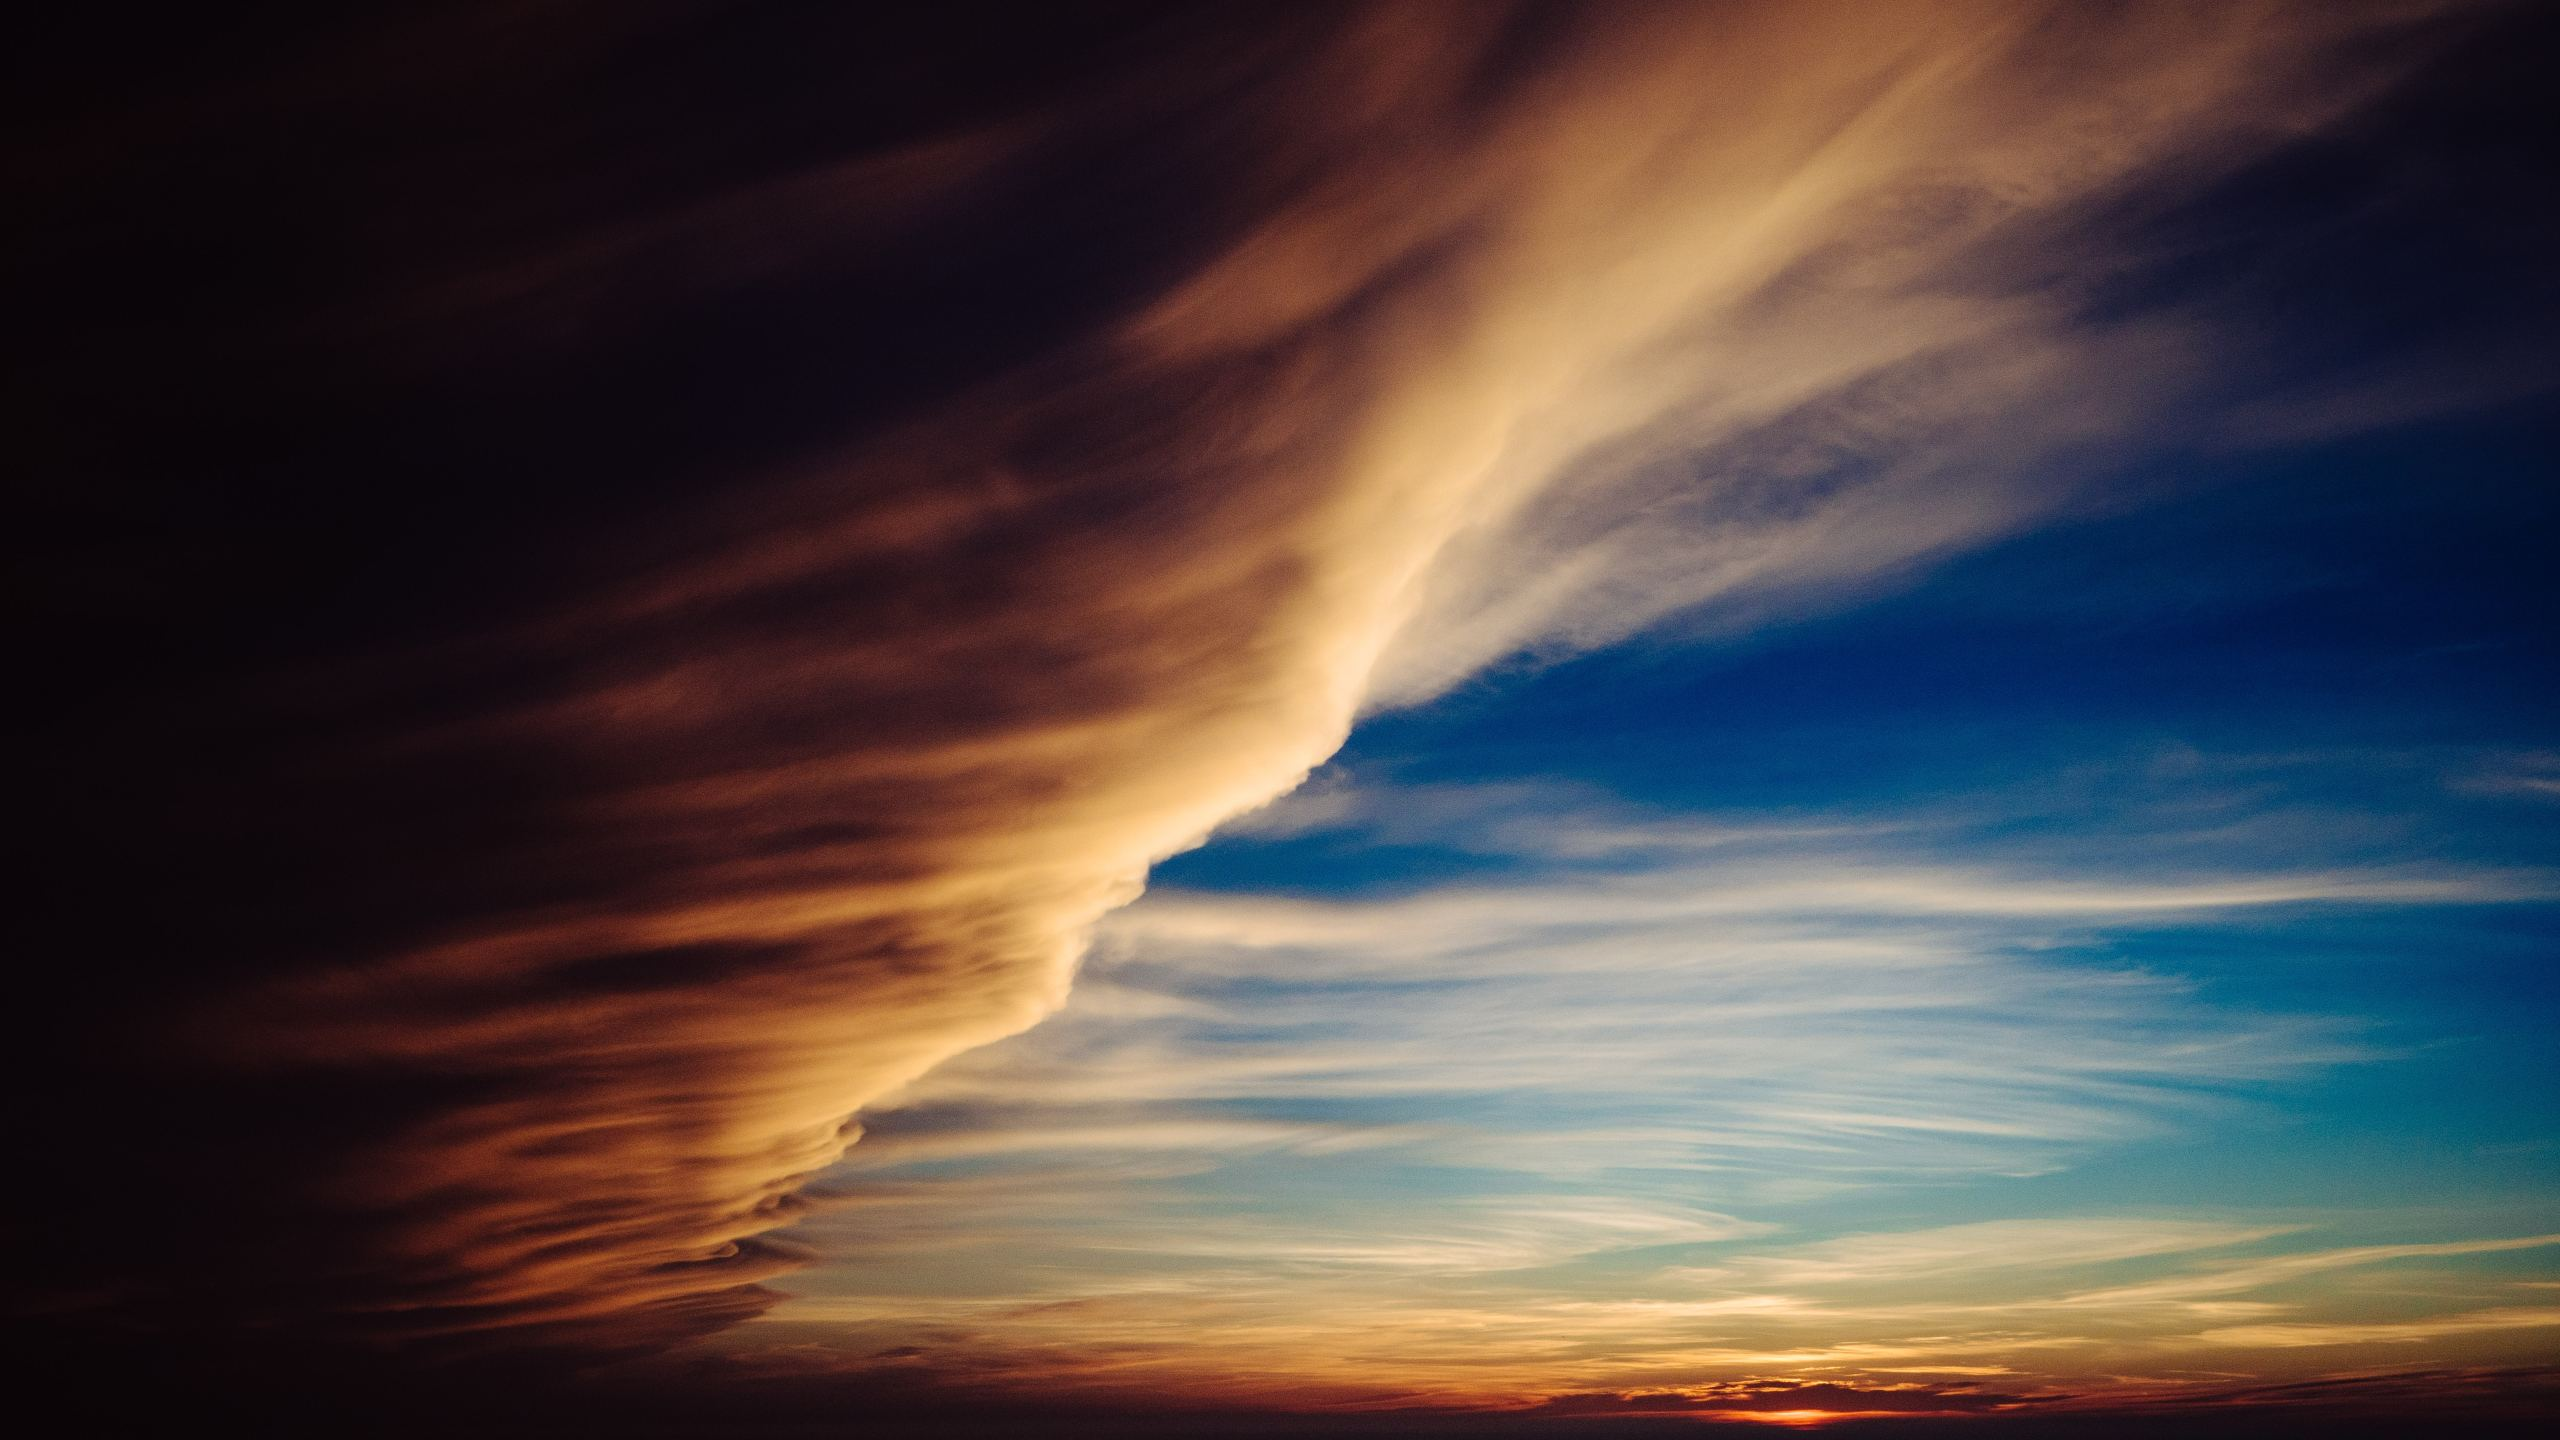 2560x1440 Clouds Like Cyclone 1440P Resolution Wallpaper HD 2560x1440